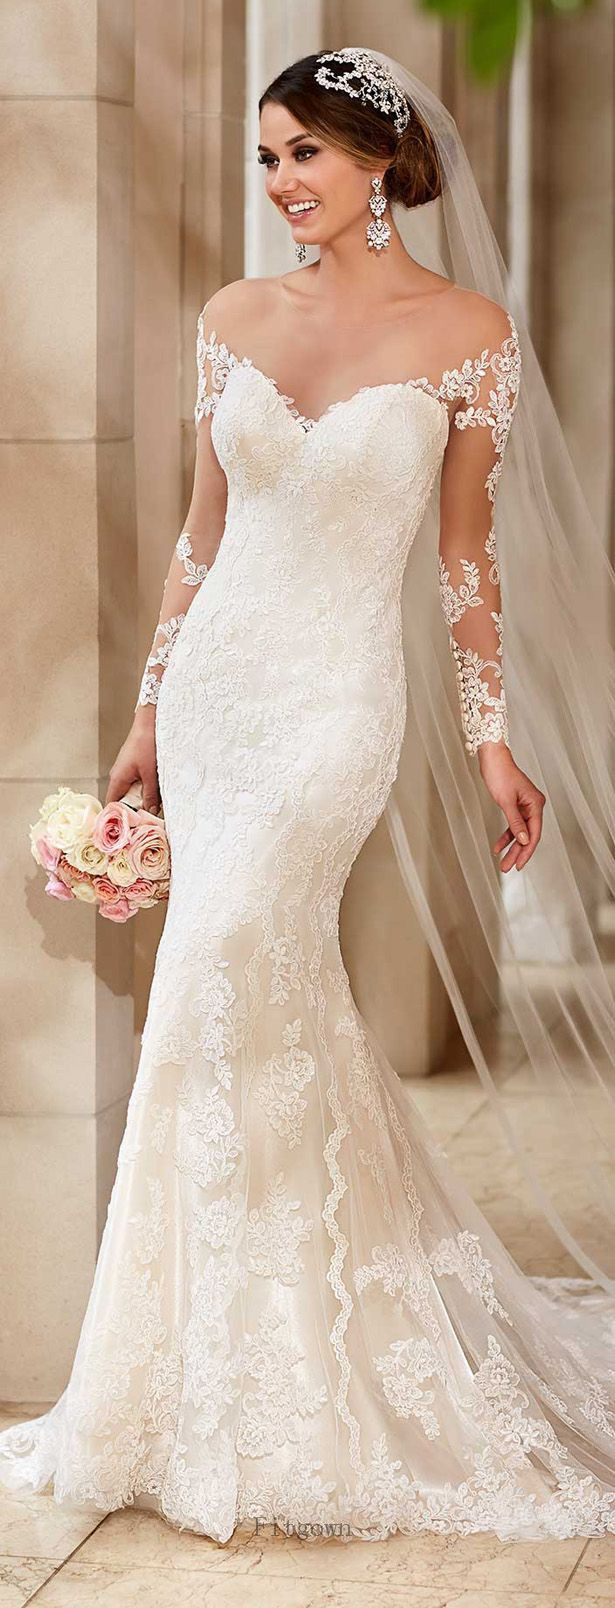 wedding dress wedding dresses http://www.babypron.com/pretty